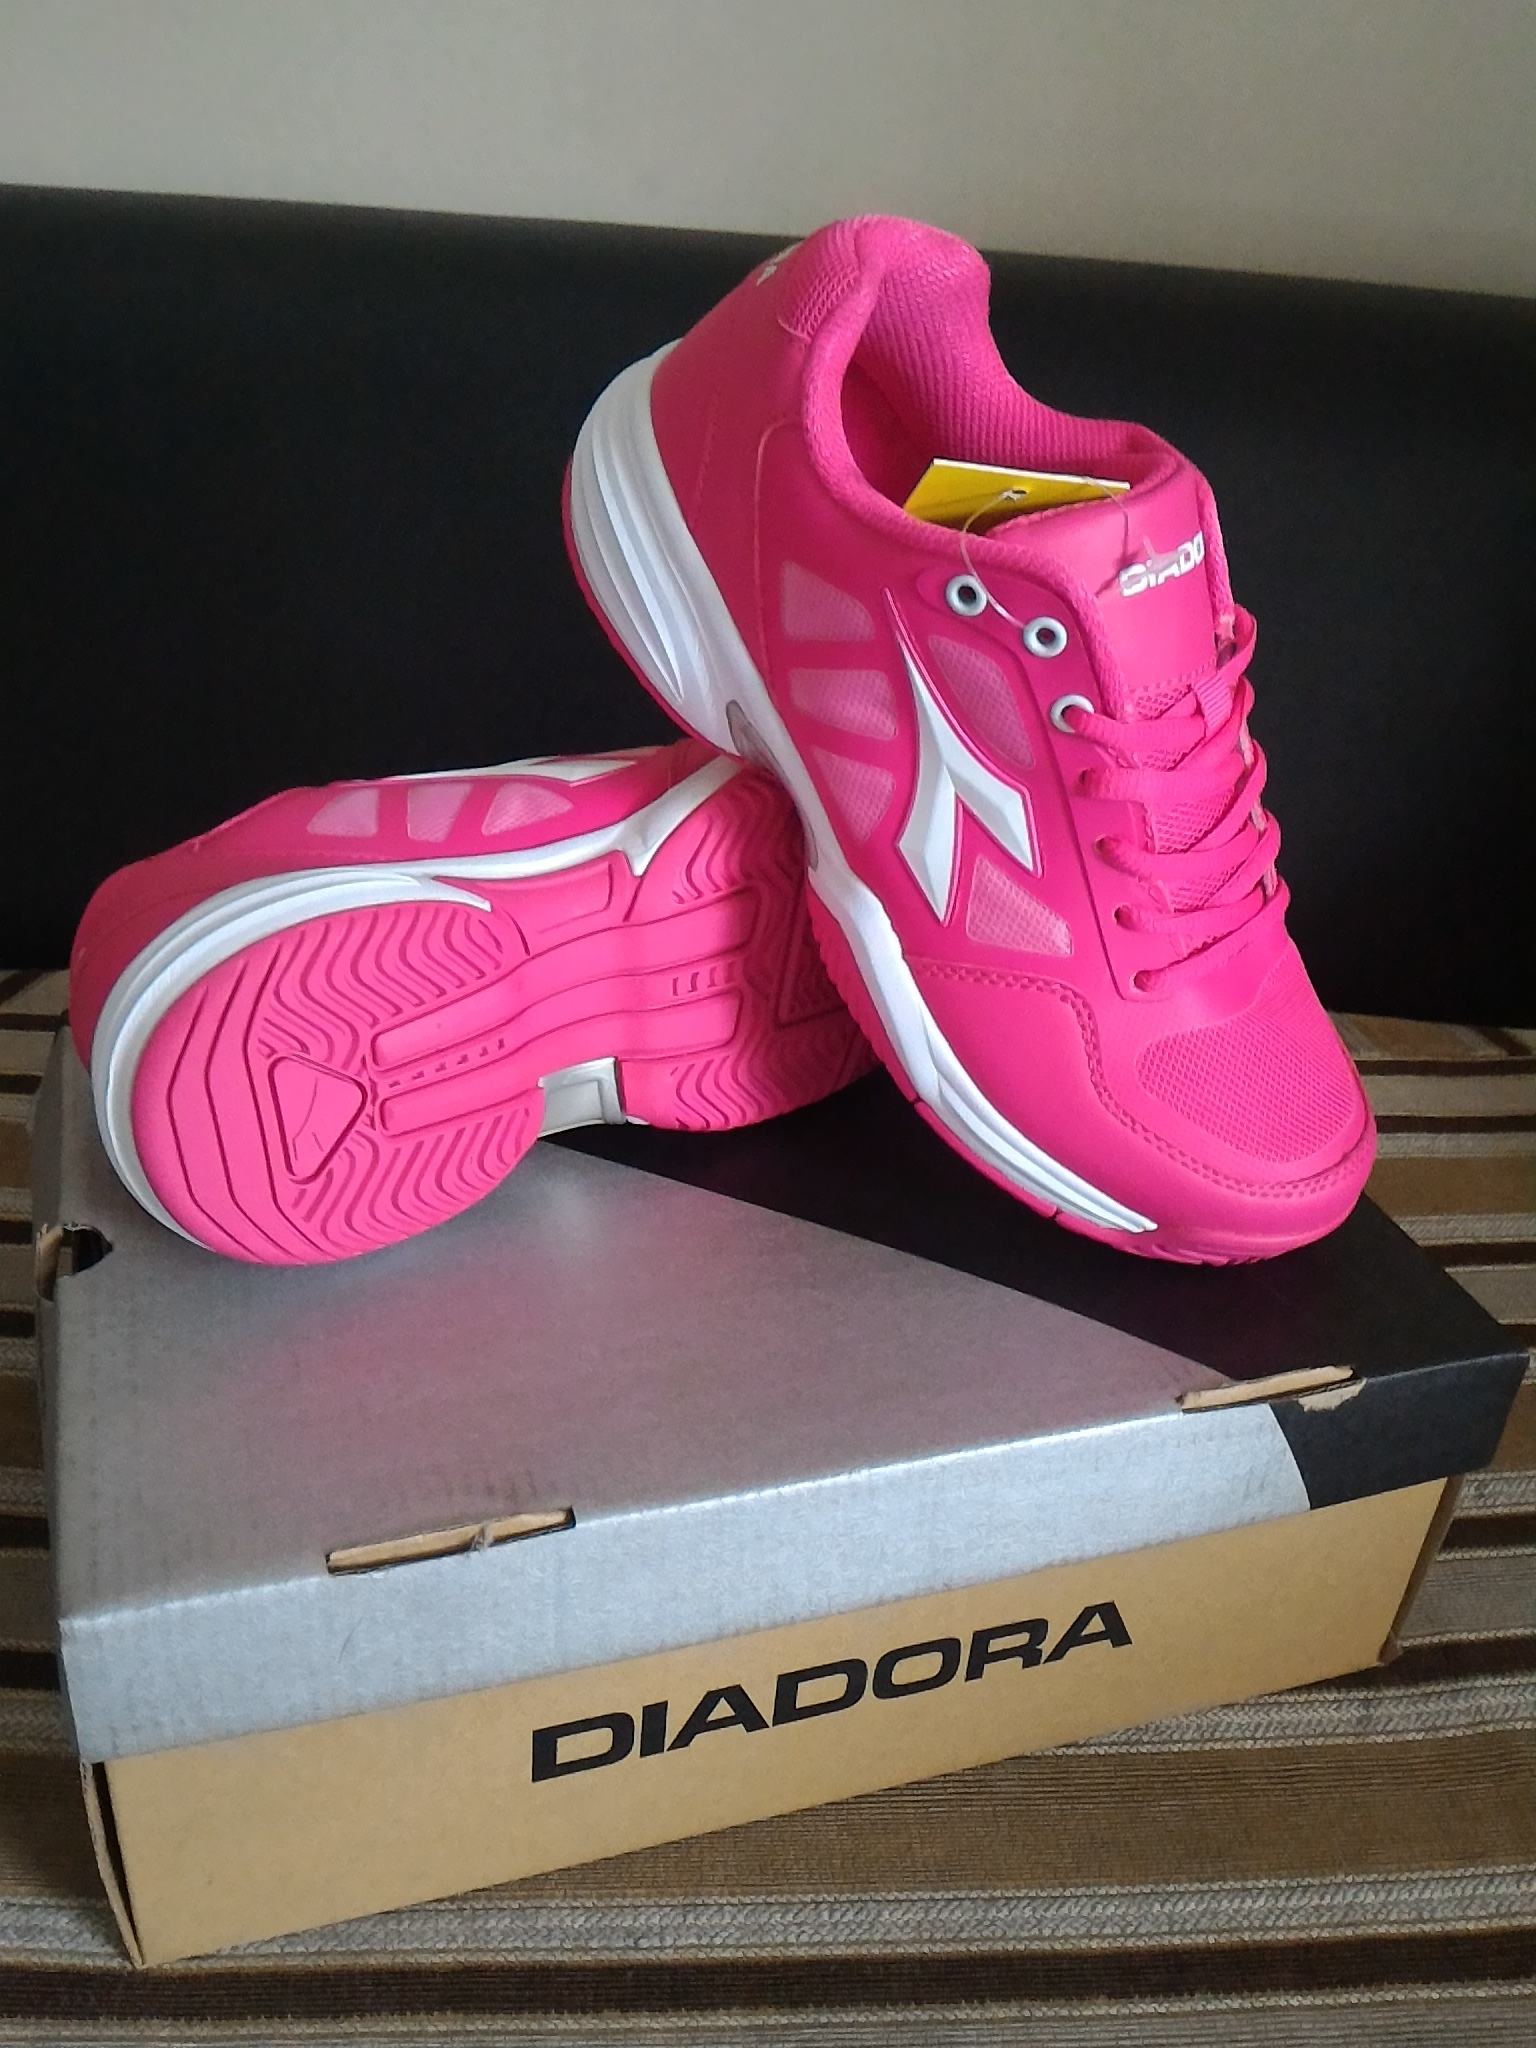 Jual Sepatu Olahraga Lari Wanita Diadora Cooper Running Original ... 963e03f1a3